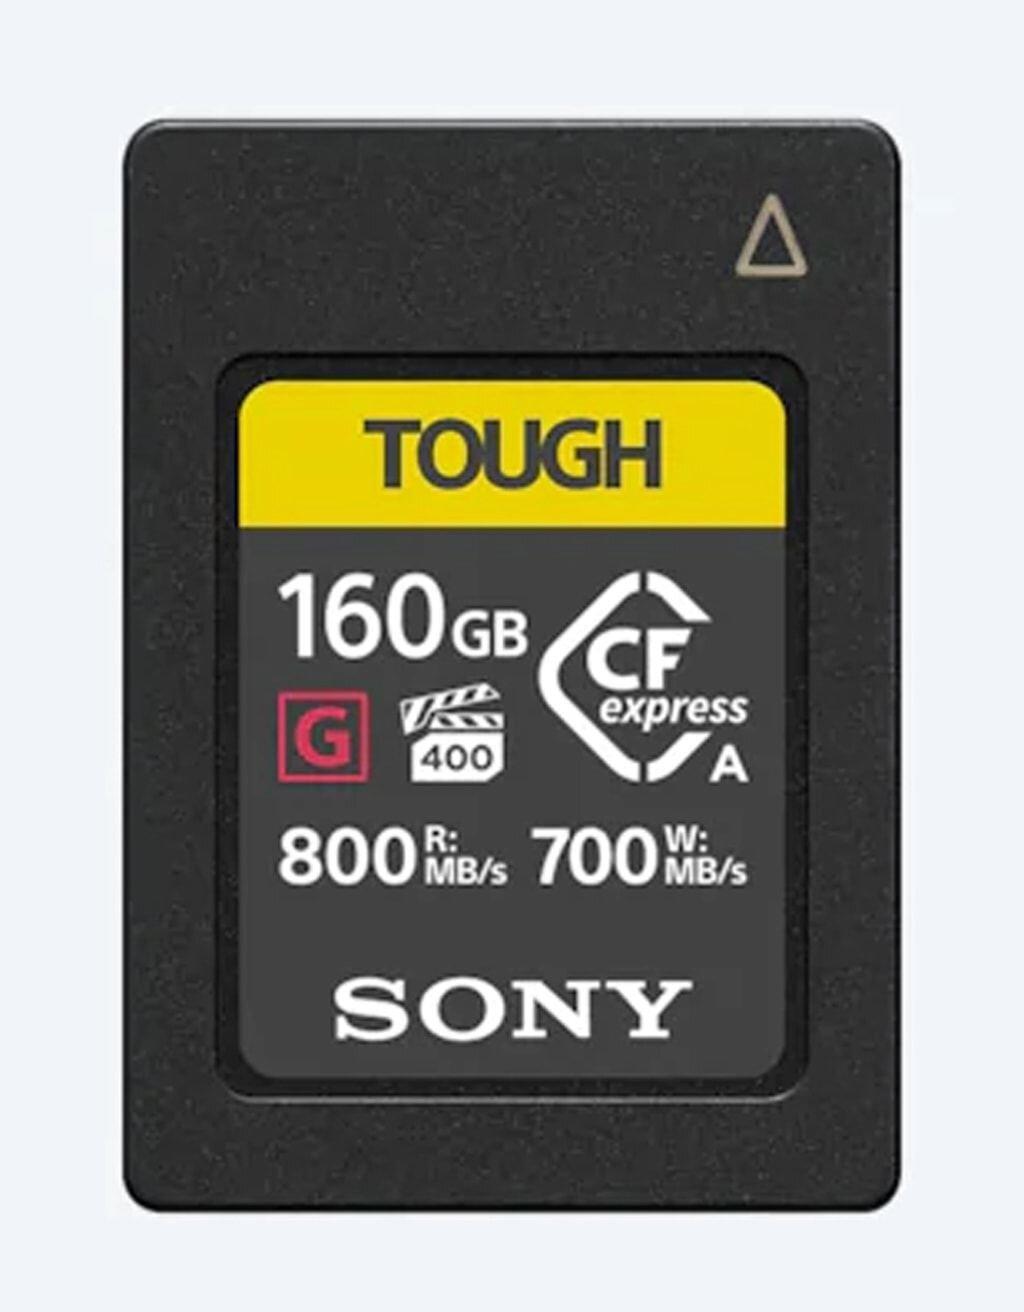 Sony CFexpress 160GB Typ A Speicherkarte